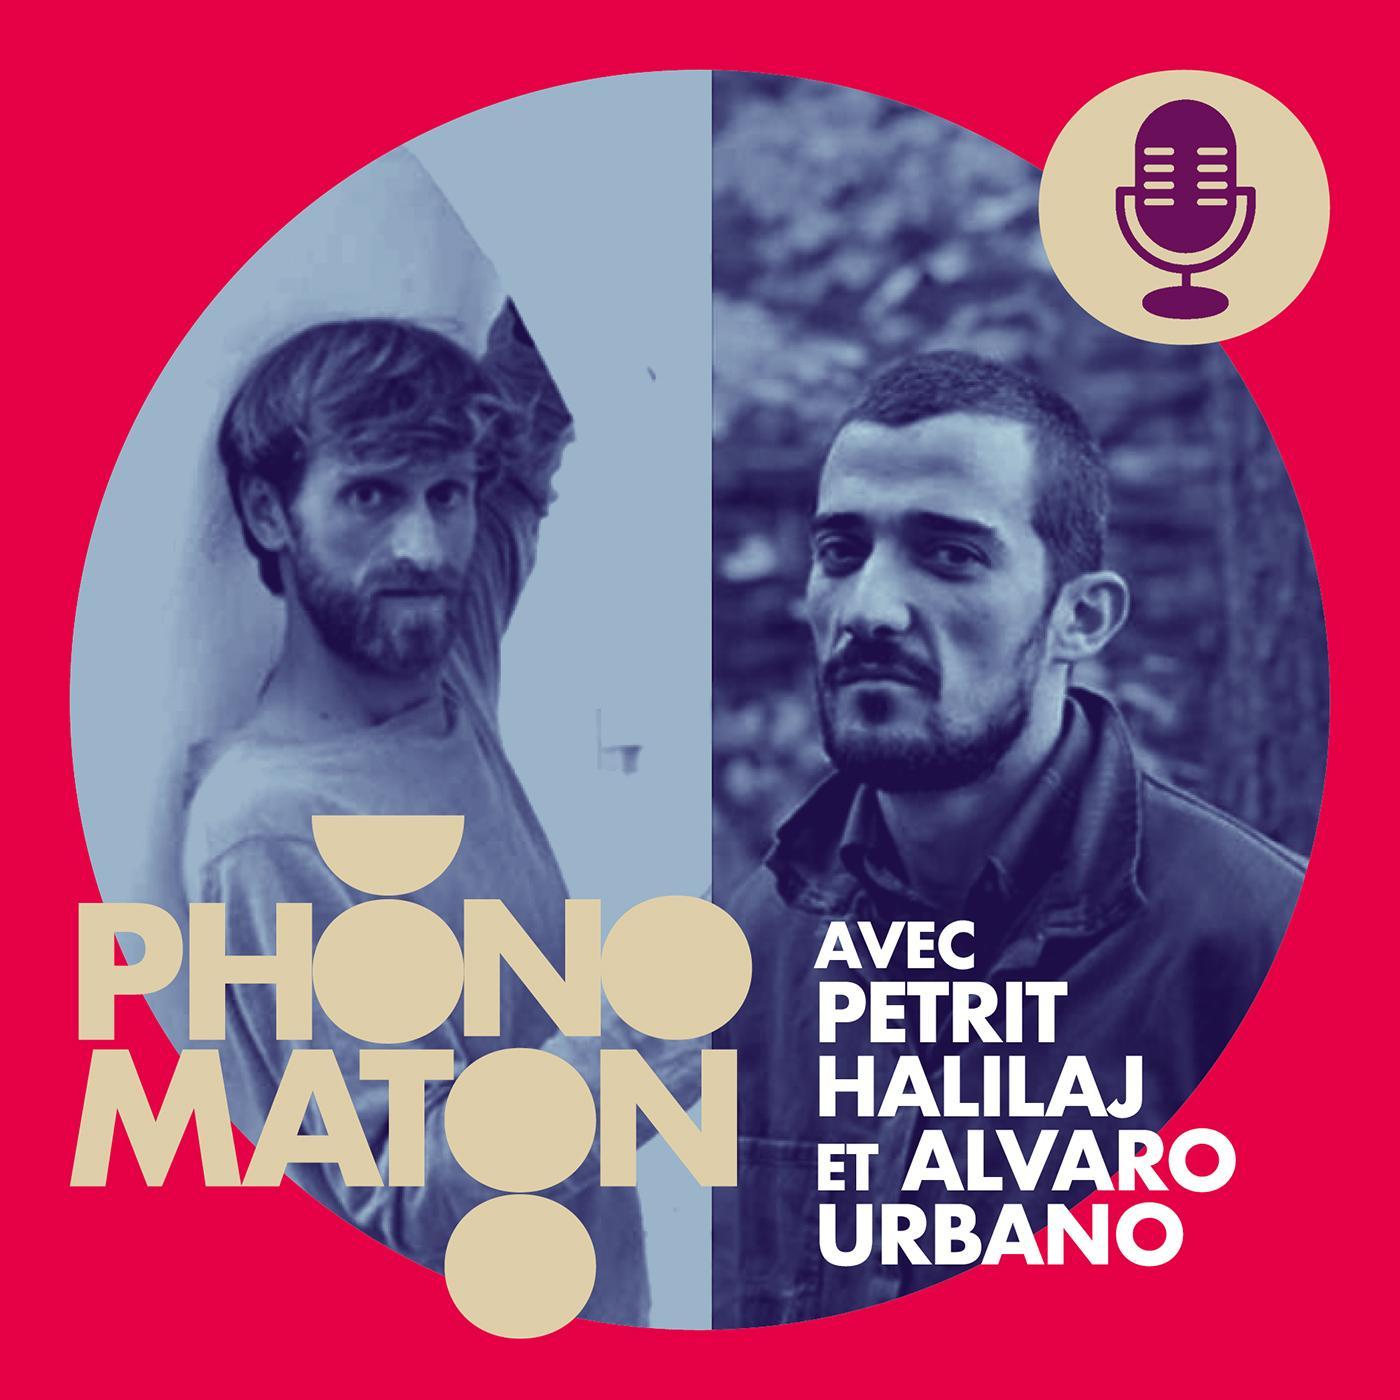 Phonomaton avec Petrit Halilaj et Alvaro Urbano